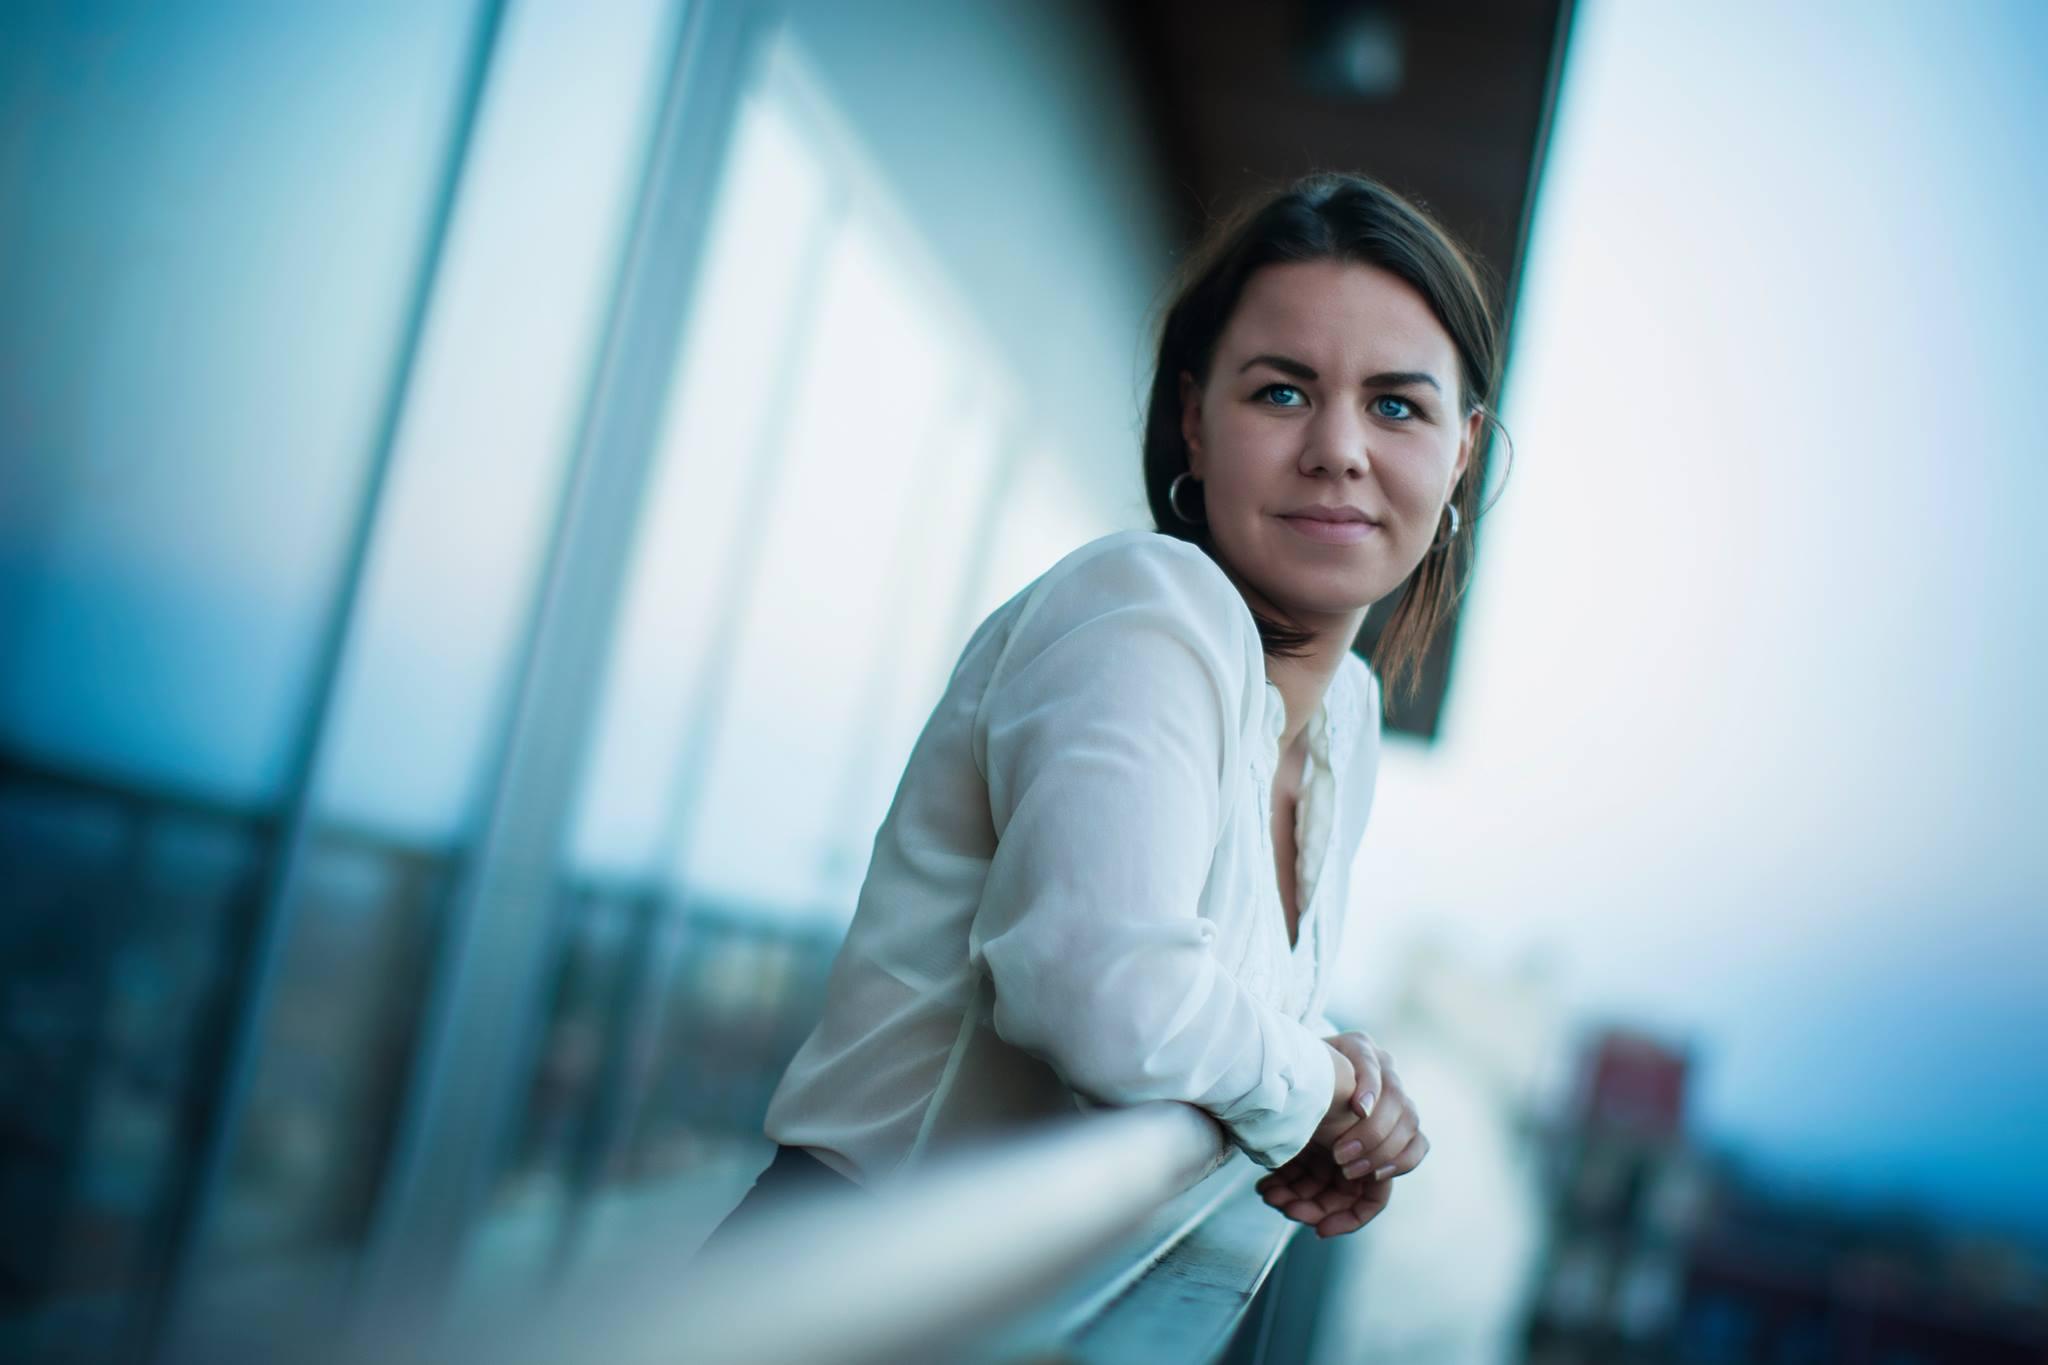 Ingrid Caroline Hopp - Balazs Szecsodi